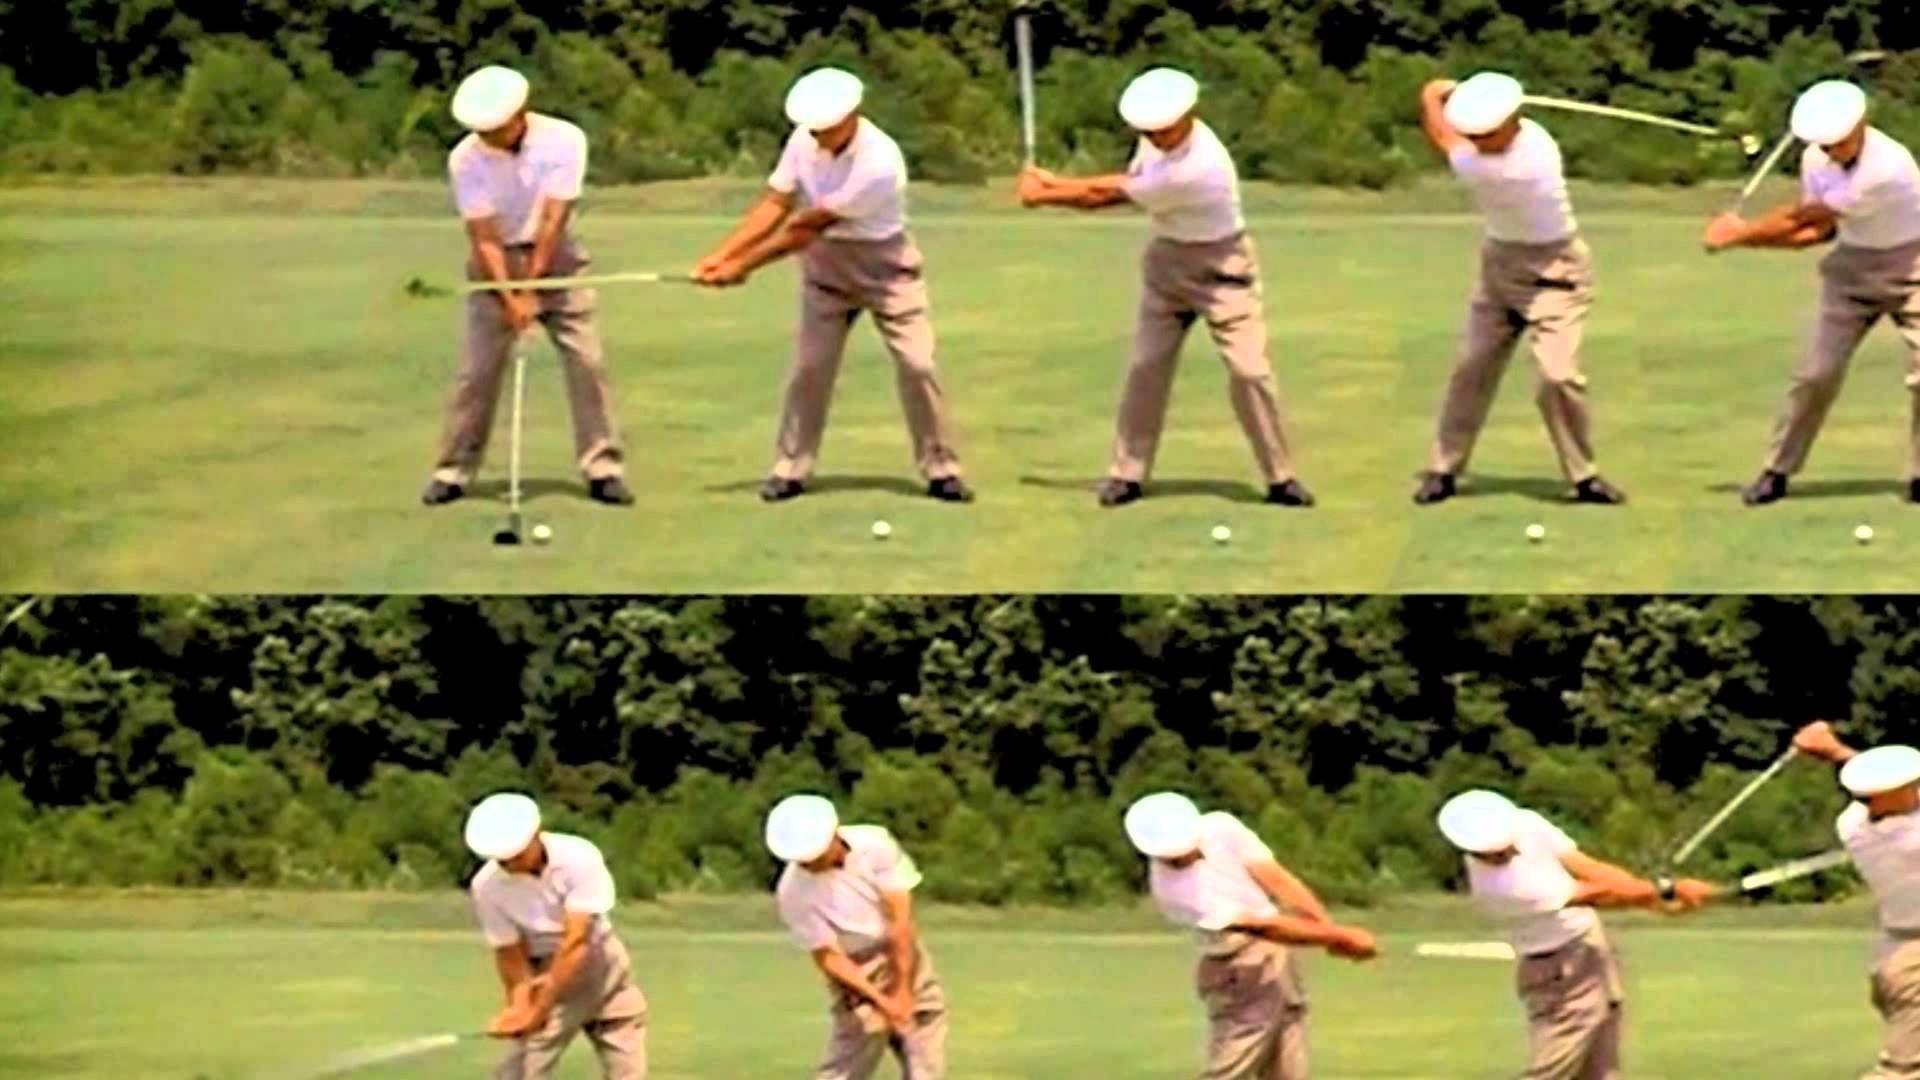 Ben Hogan Golf Swing Sequence - YouTube. ScenicCityGolf.com ...